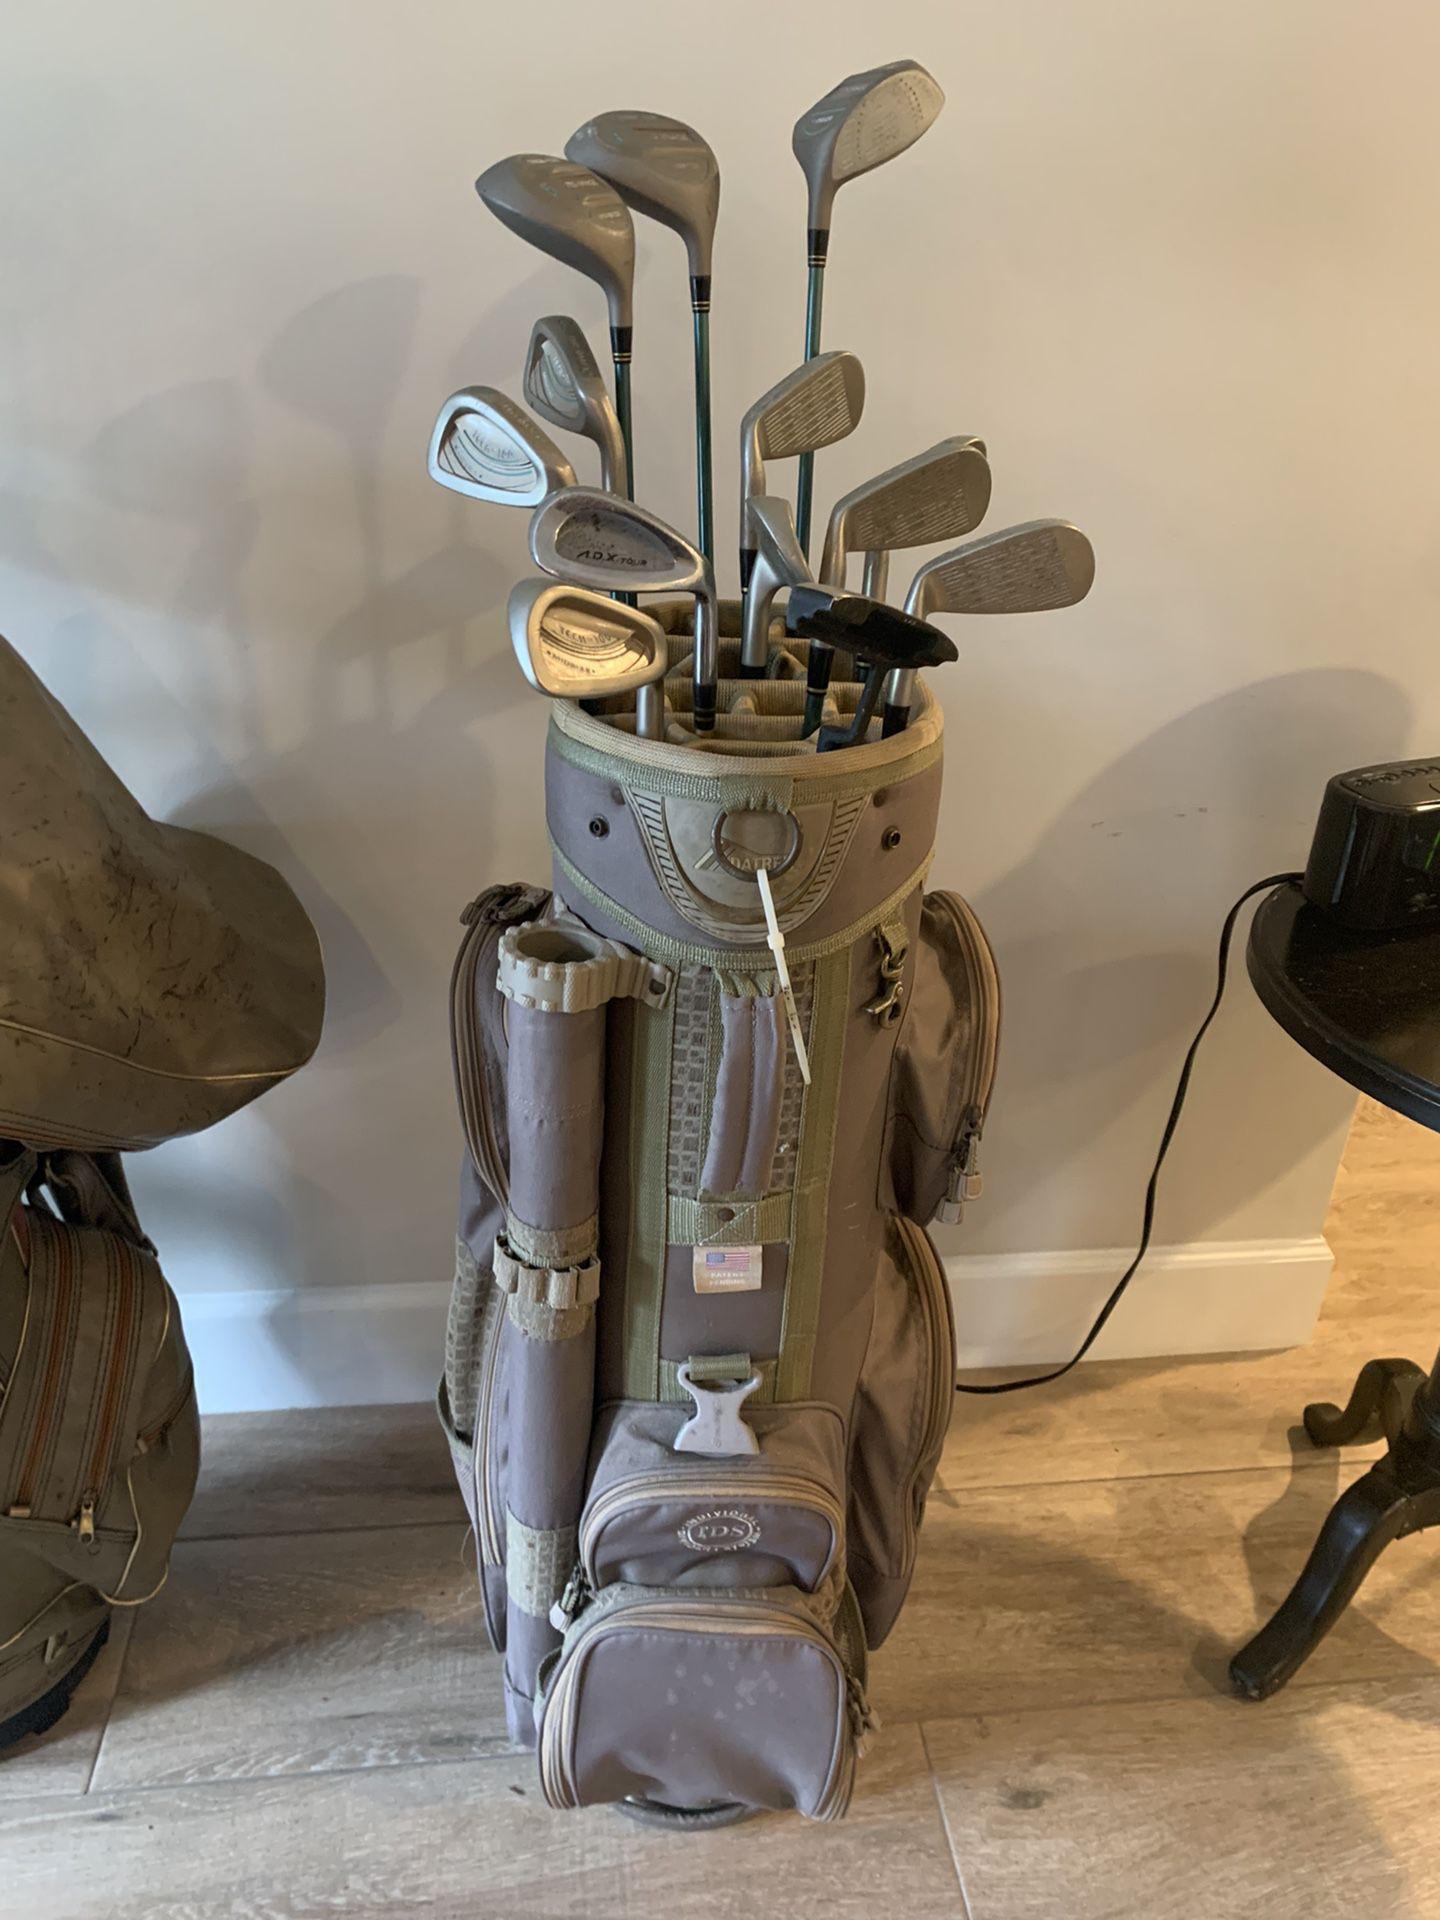 Full Set Of Golf Clubs & Golf Bag